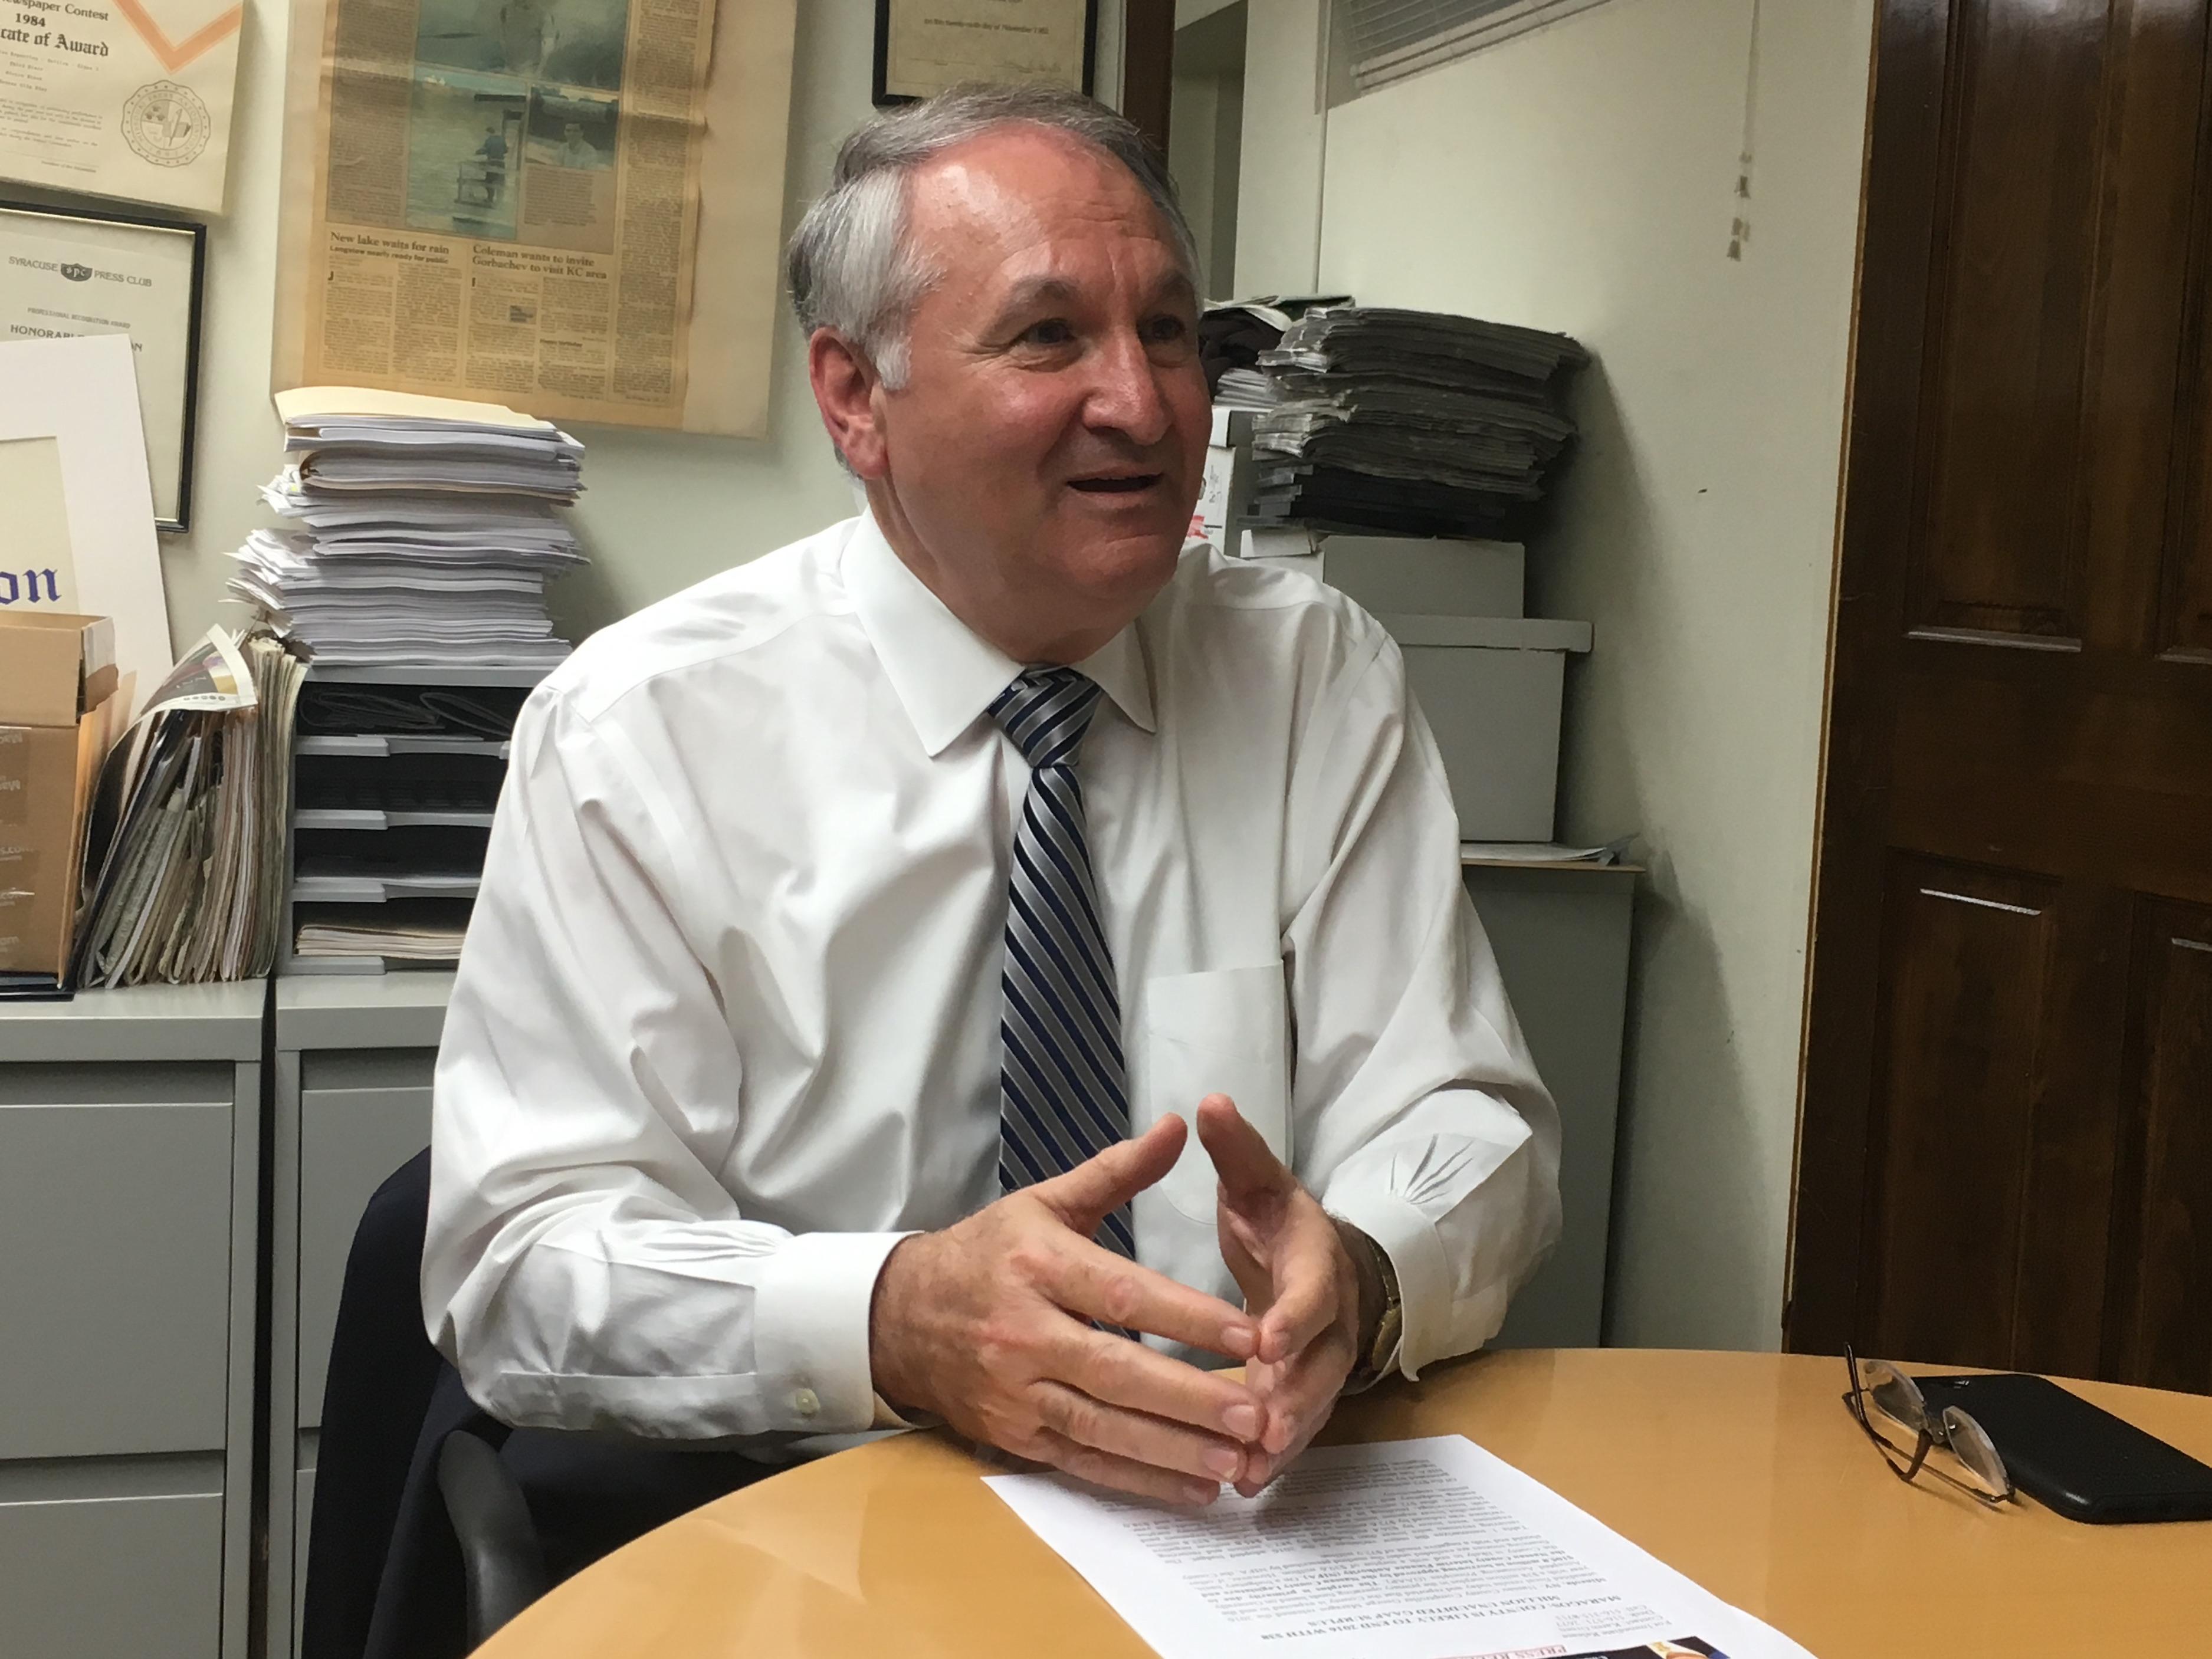 Maragos defends surplus claim, calls for more straightforward reporting